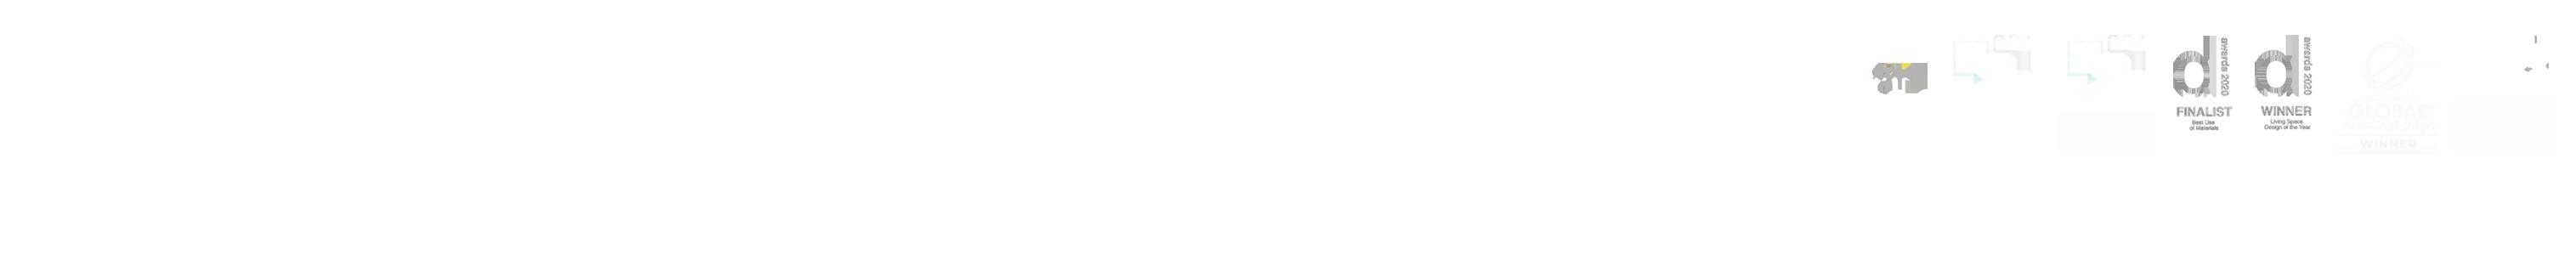 paul mcaneary awards